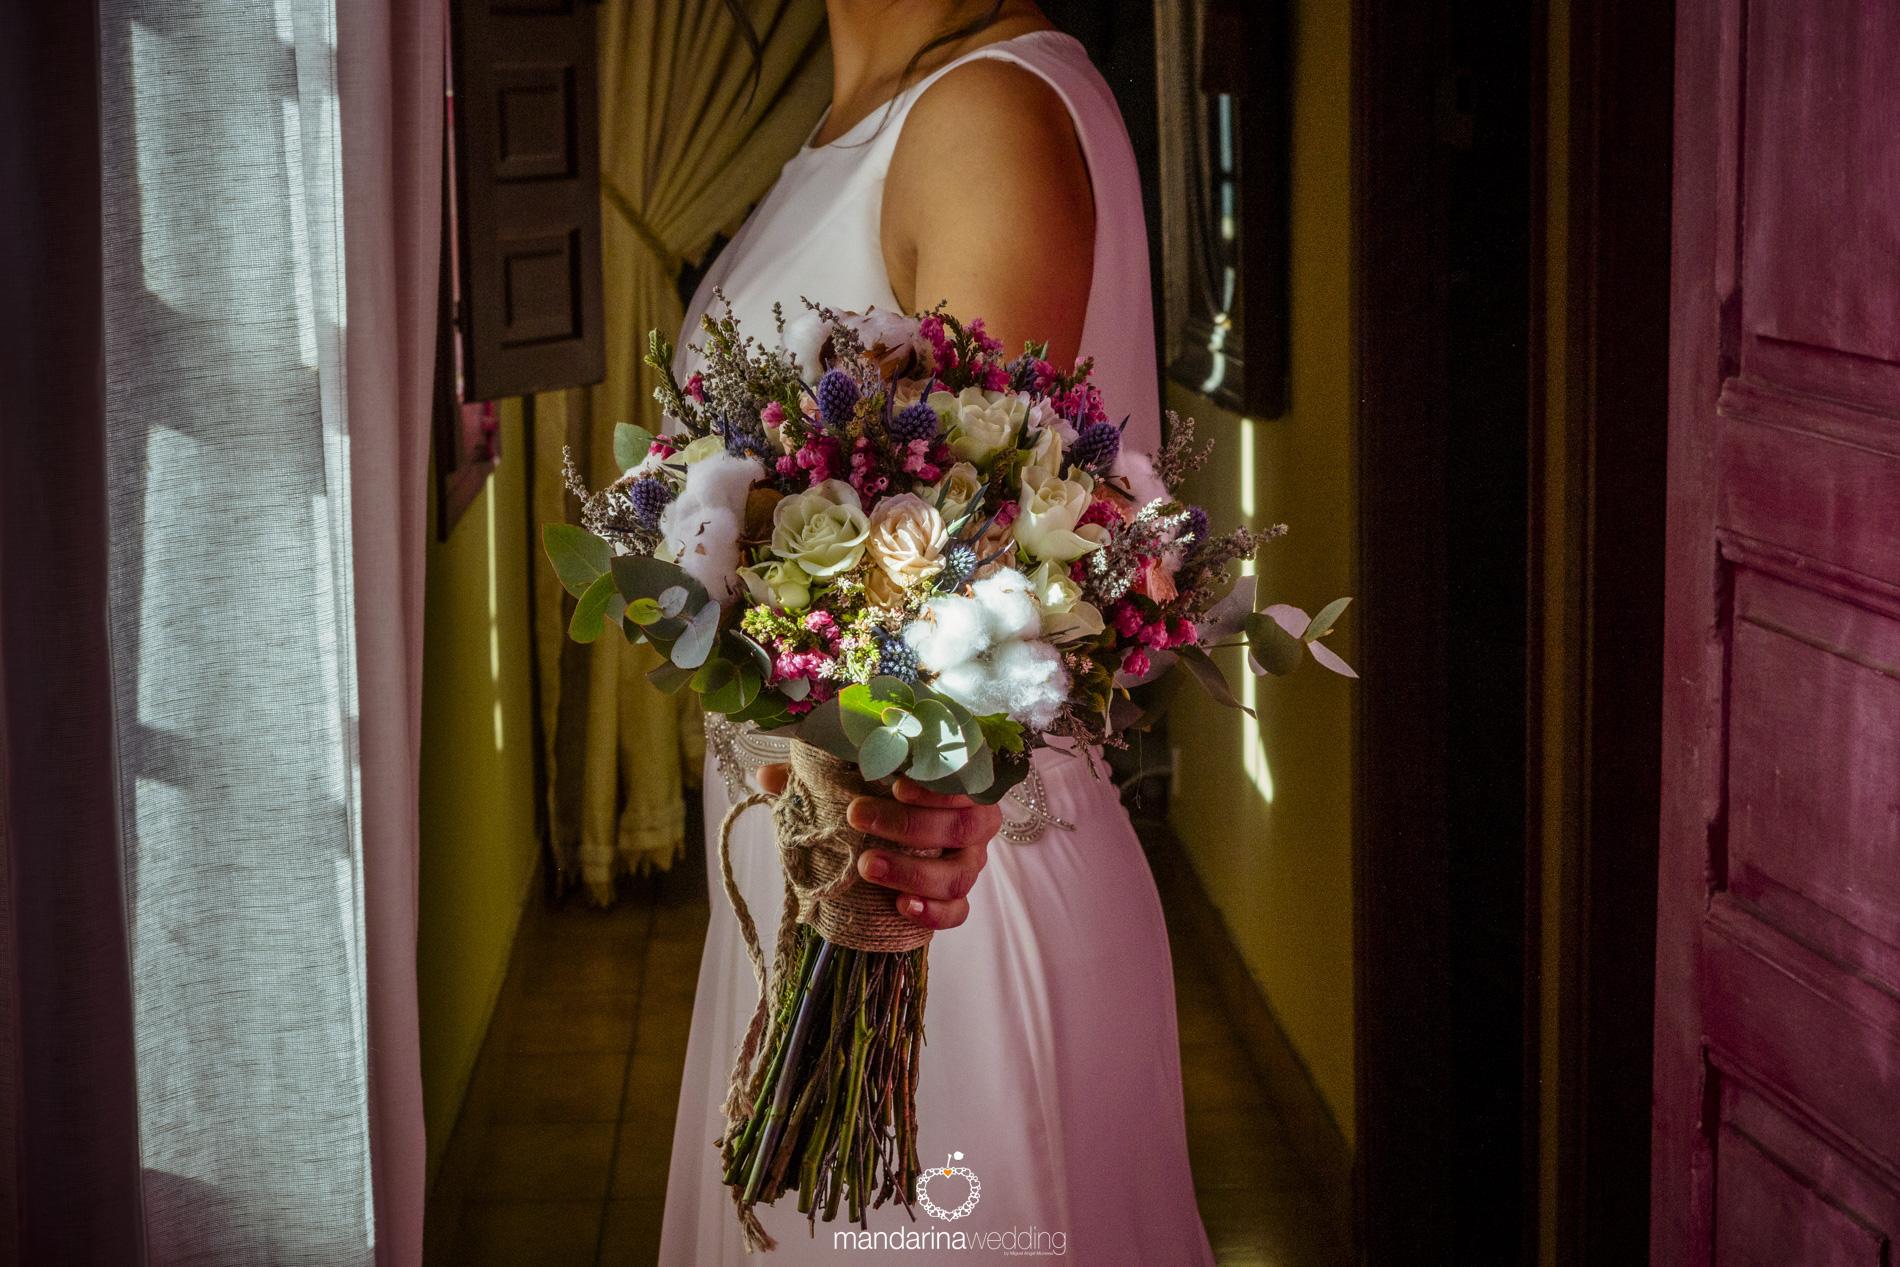 mandarina wedding, fotografos de boda, fotografo boda soria, fotografo boda barcelona, fotografo boda Madrid, fotógrafo boda lerida_36